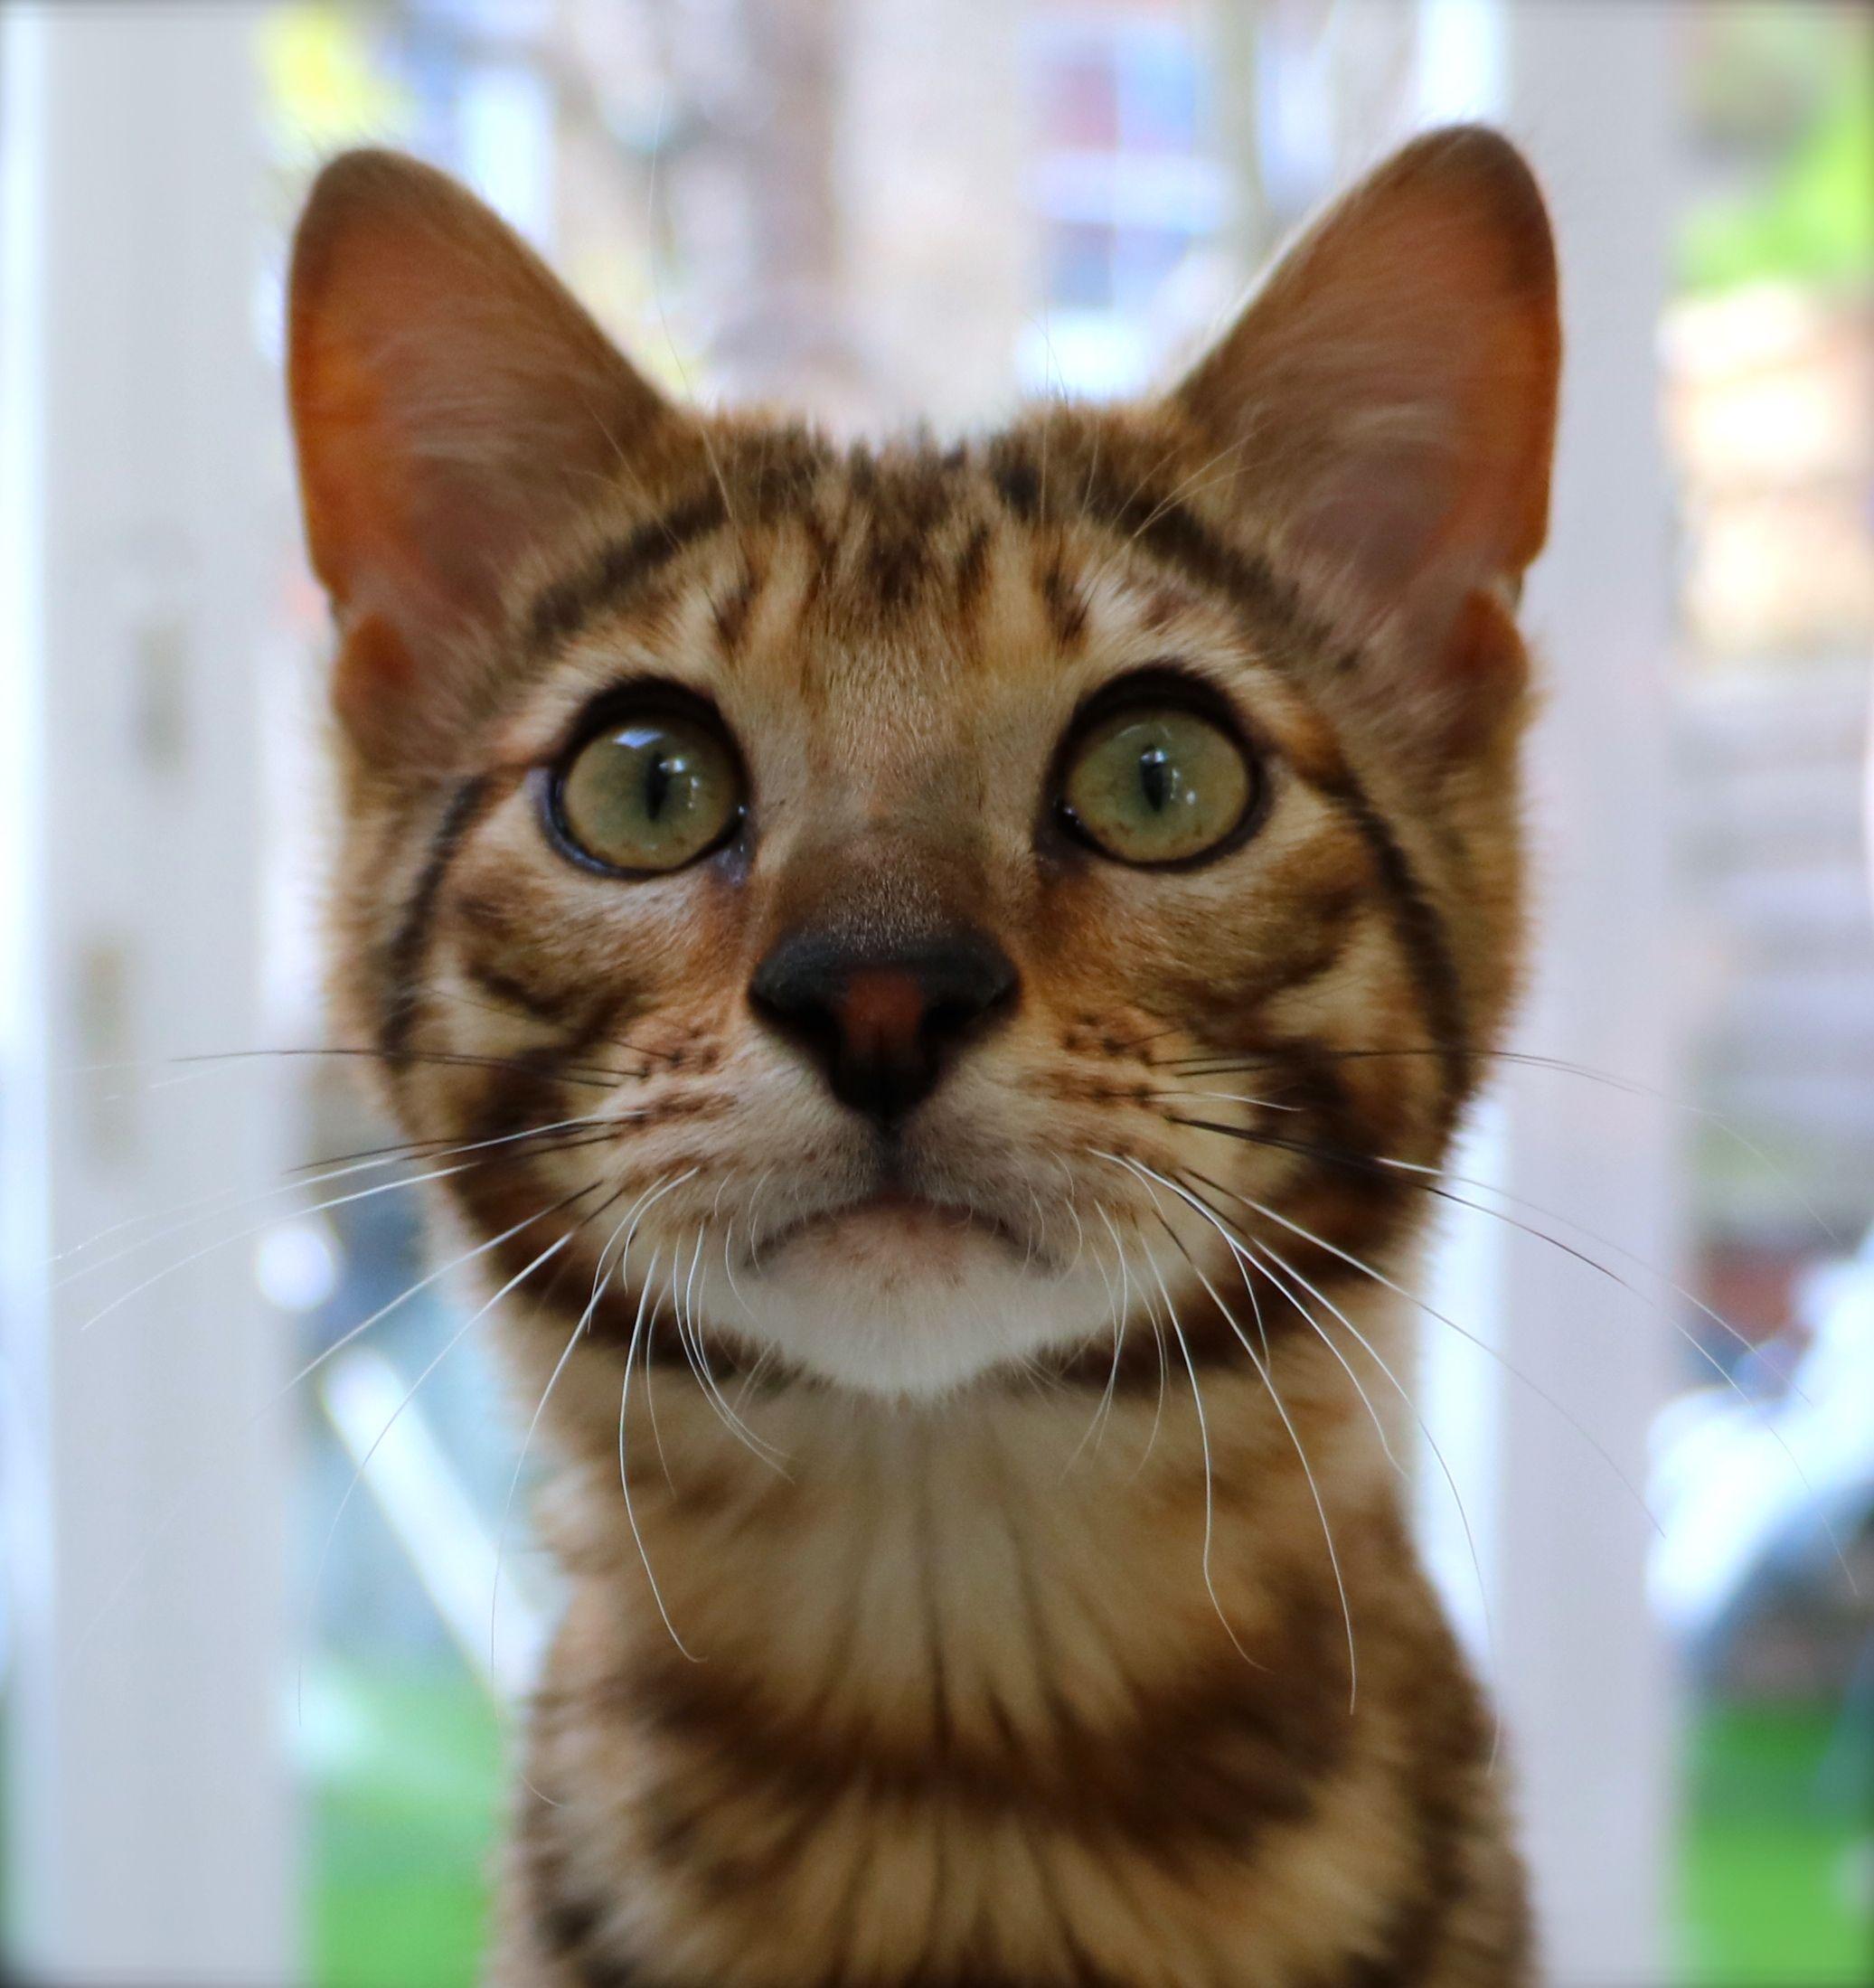 A Pretty Cute Cat I Met In My Street Http Ift Tt 2qfjkey Bengal Cat Cats Pretty Cats